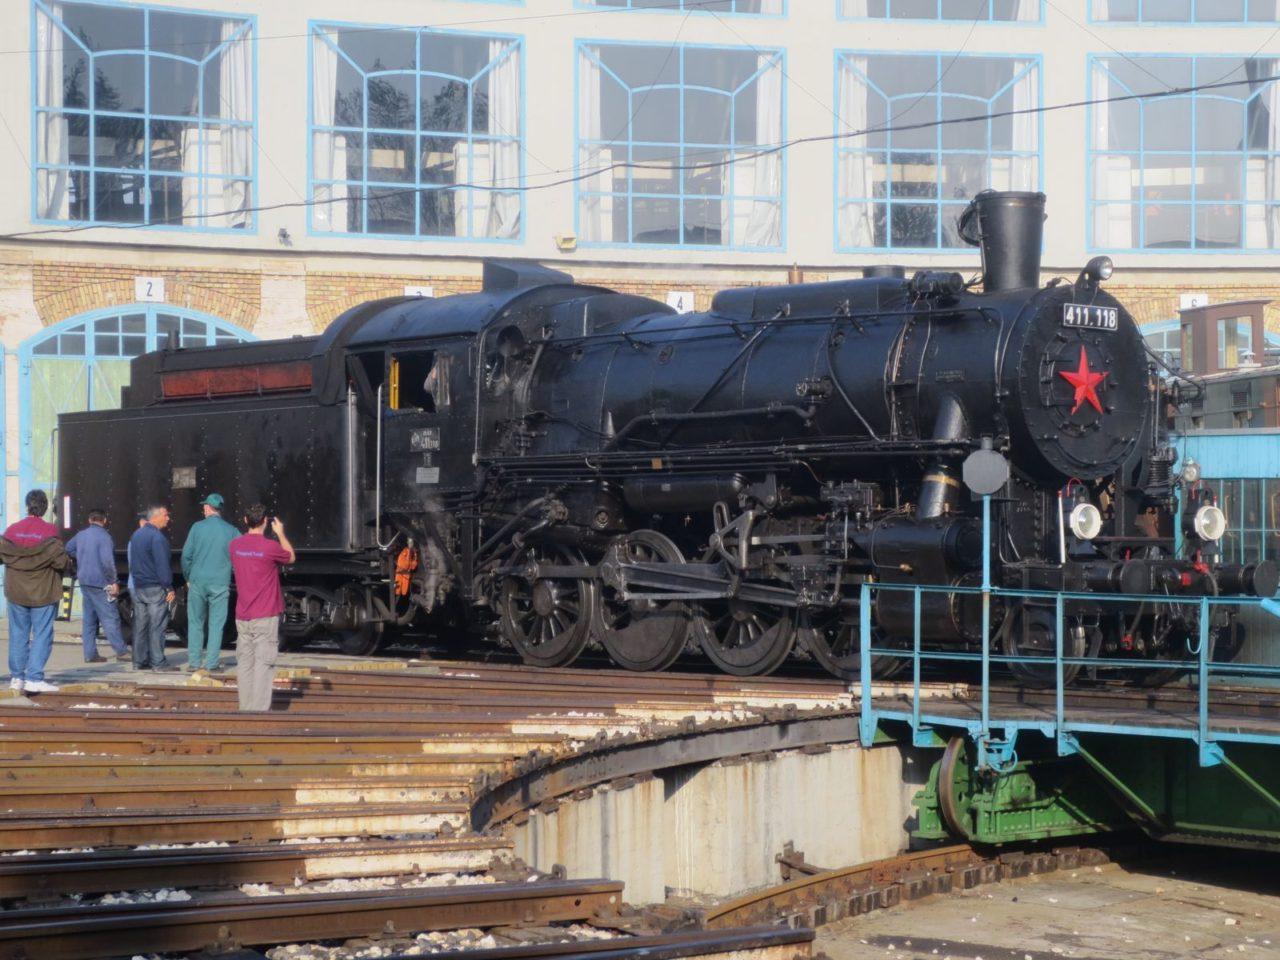 Temofeszt 2014 - lokomotiva před rotundou